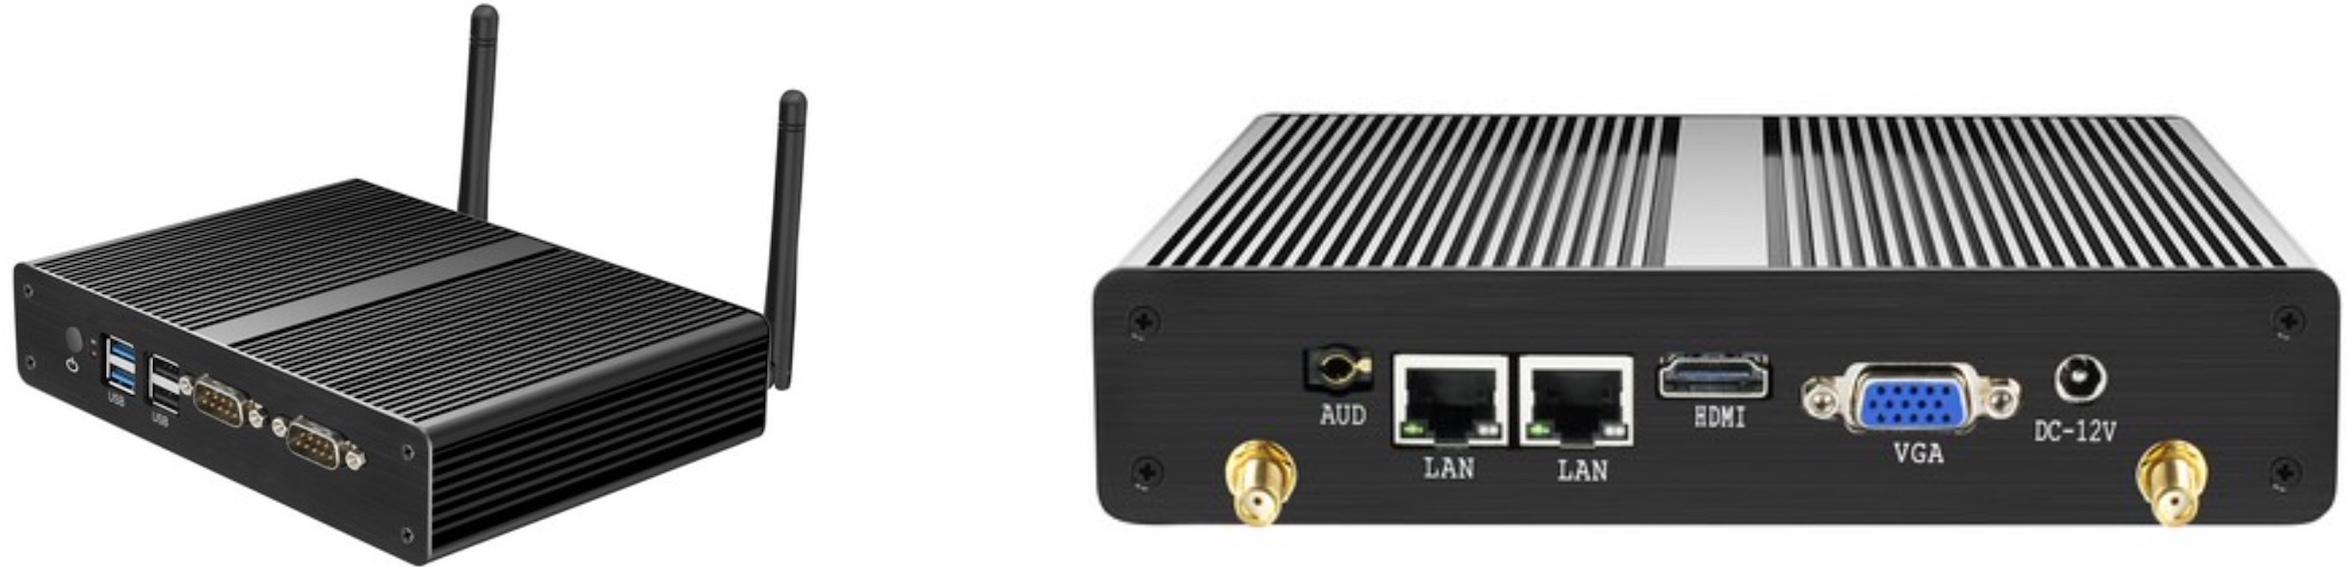 Mini-Server-PC - Industrieller Mini-PC: Ein vielseitiger Server zum kleinen Preis?